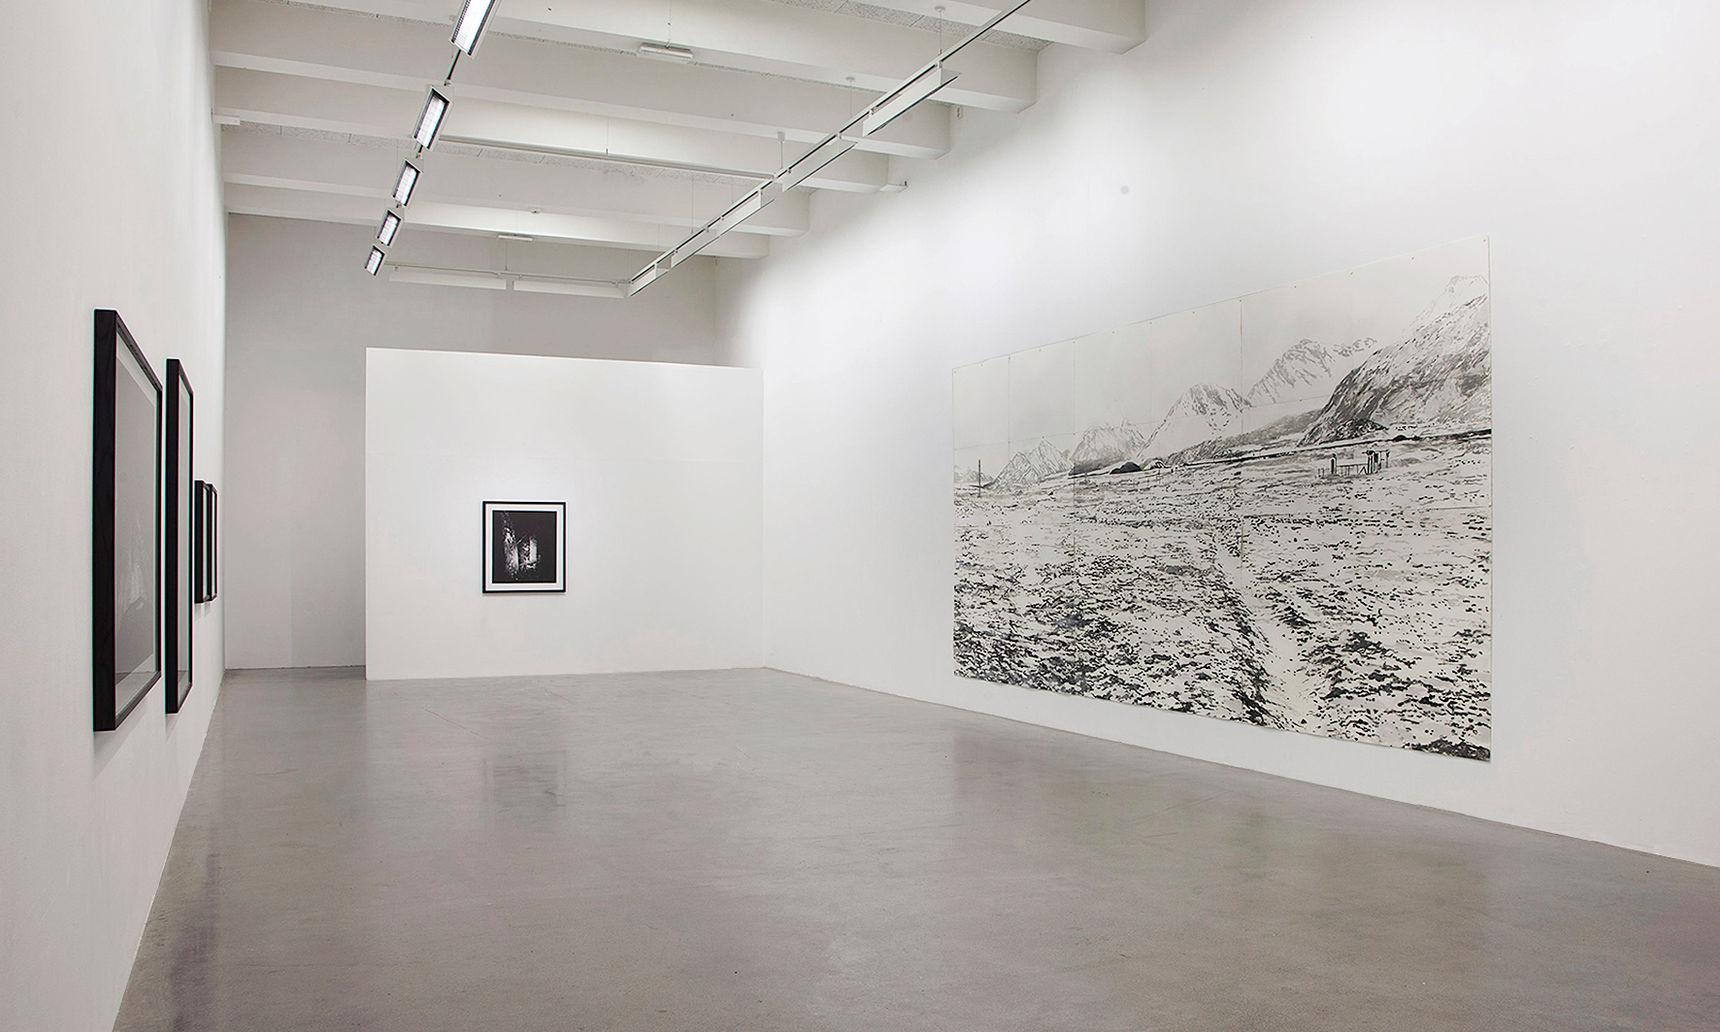 Trafo Kunsthall with Mattias Härenstam (framed works)